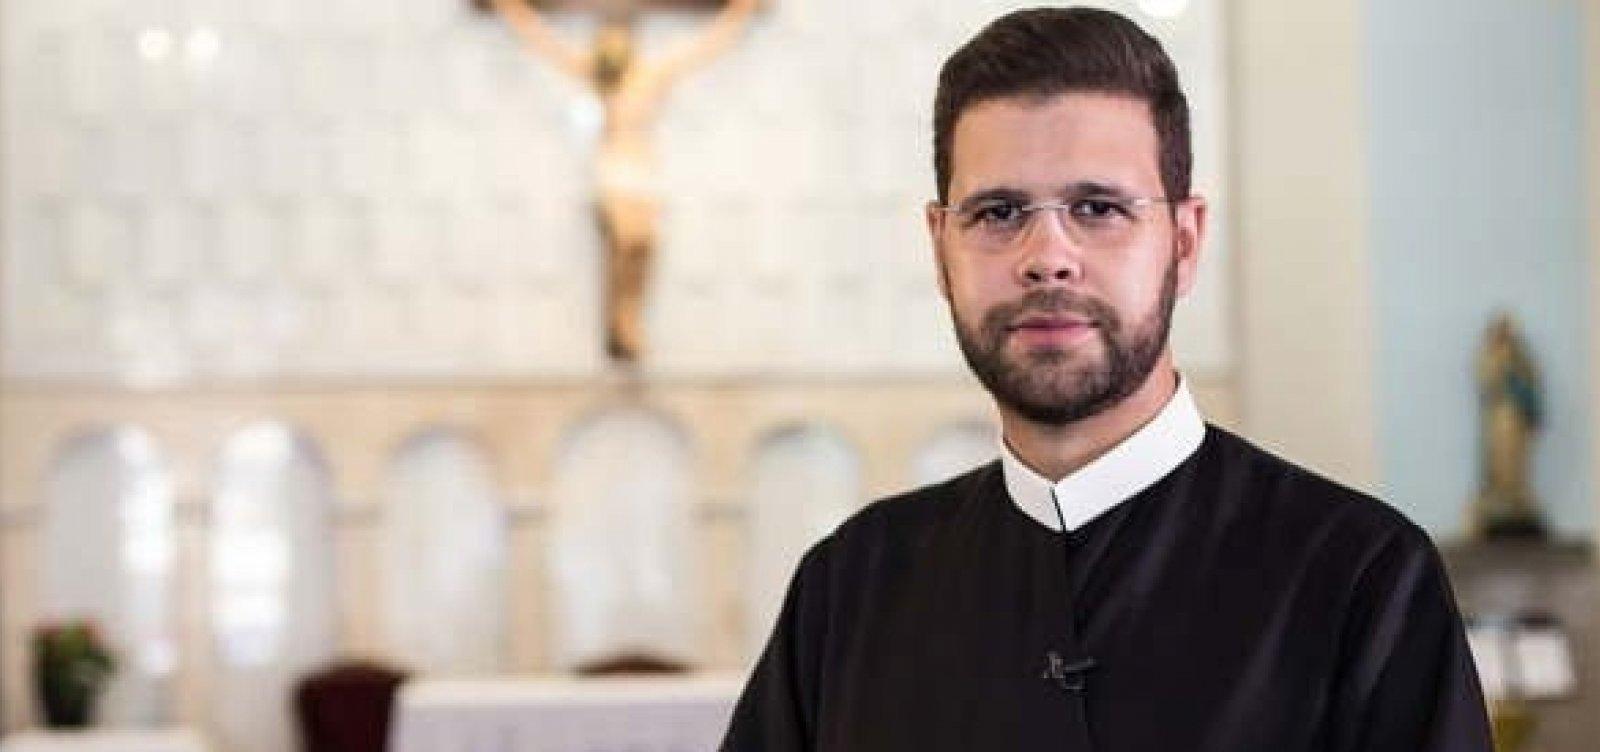 [TV católica desautoriza padre que pediu verba a Bolsonaro]